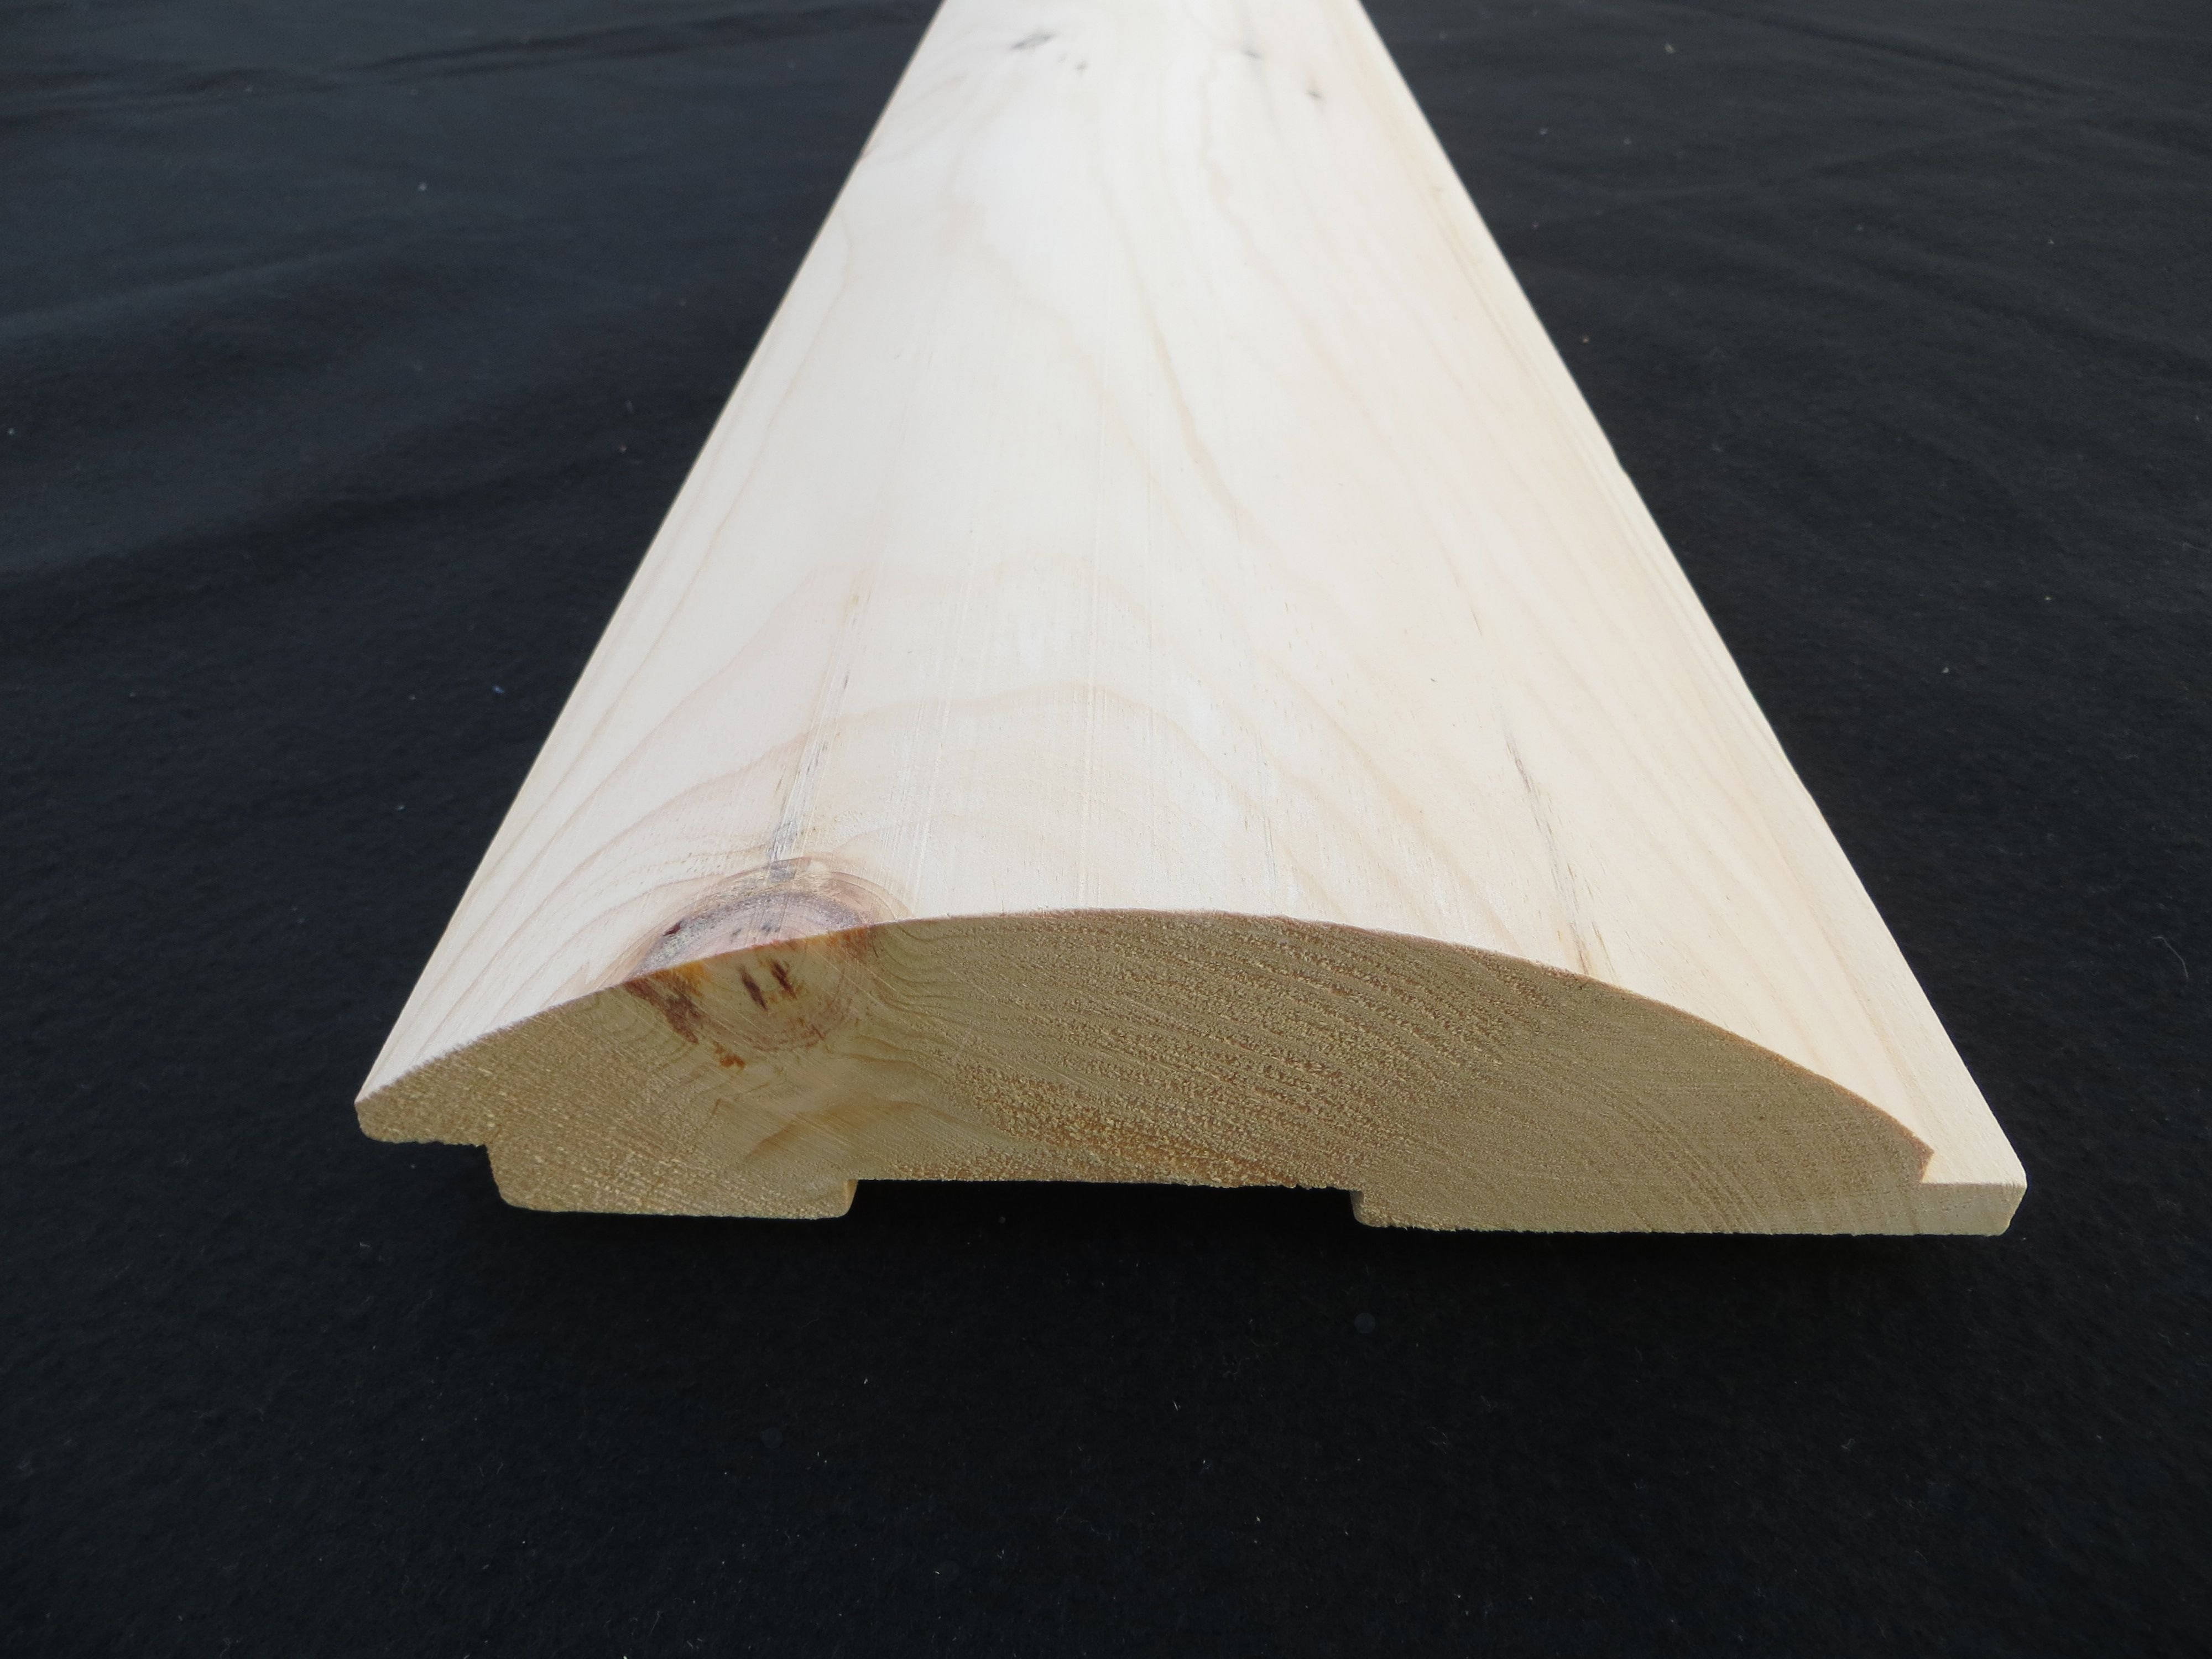 3x8 log siding hand hewn pine - 3x8 Log Siding Hand Hewn Pine 47